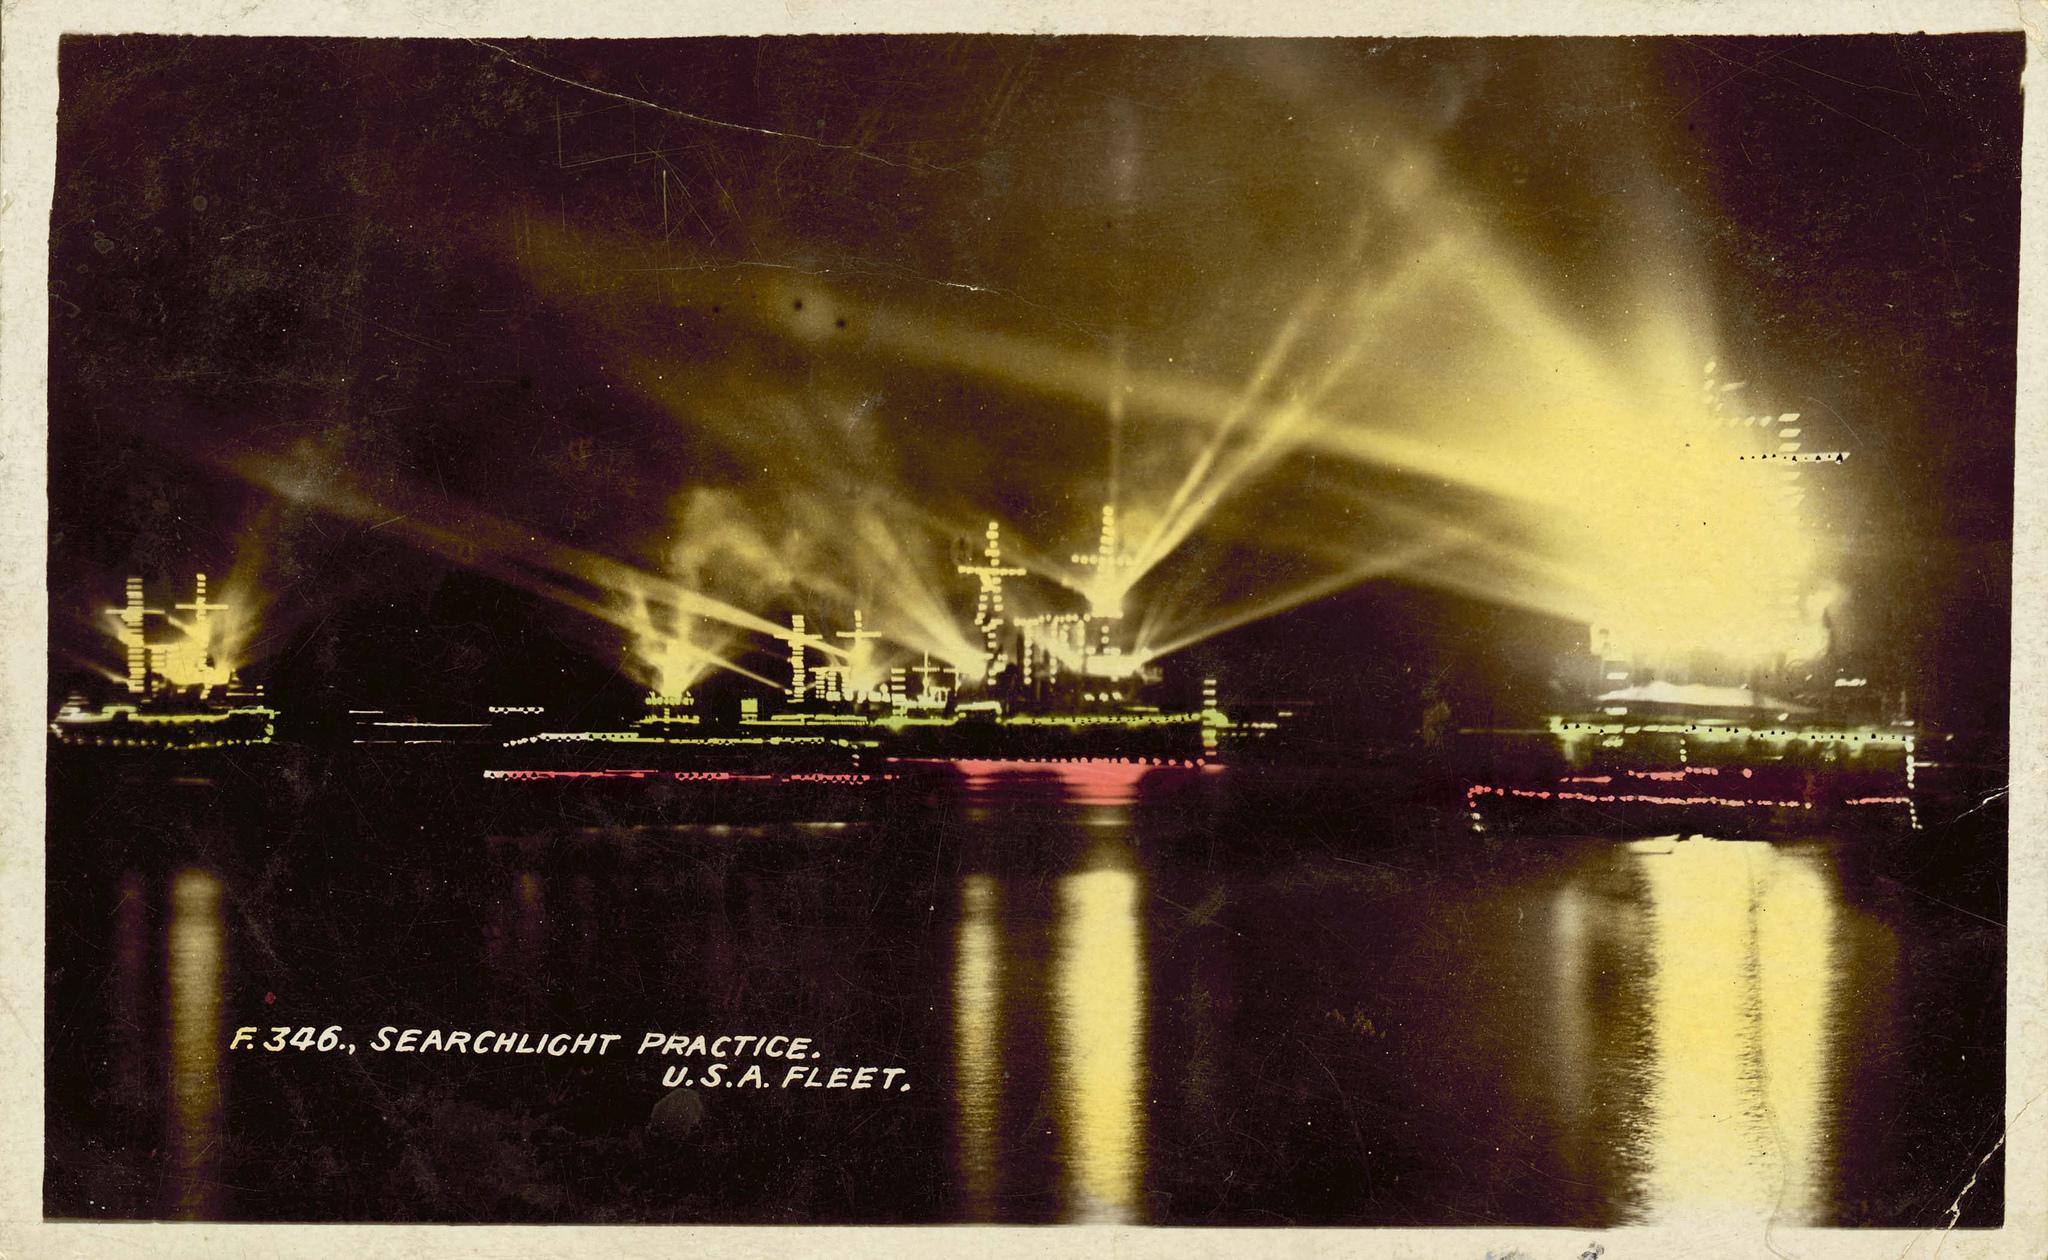 Searchlight practice, US Navy Fleet, 1908, Australian National Maritime Museum